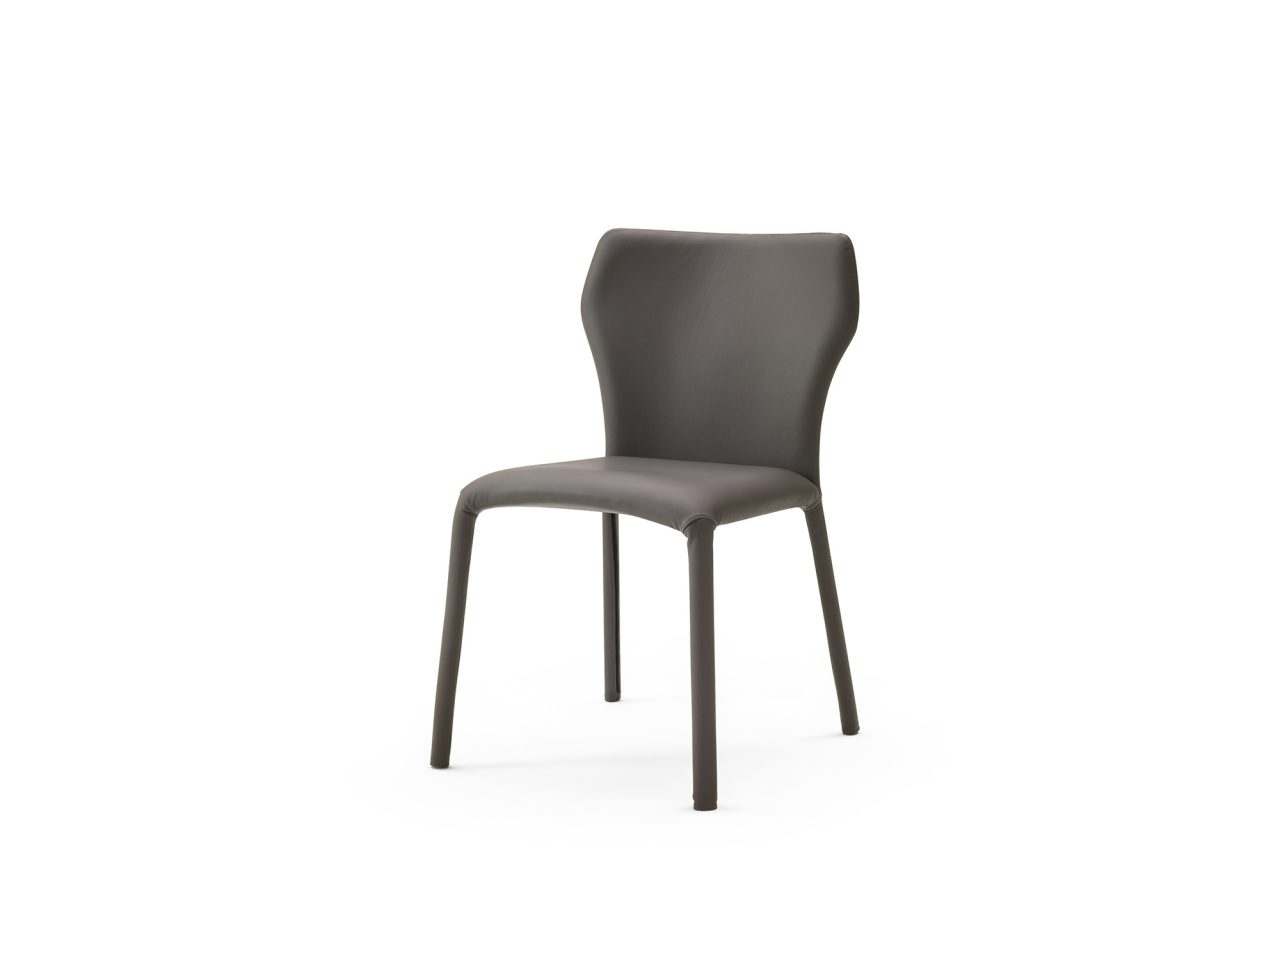 Shila dining chair